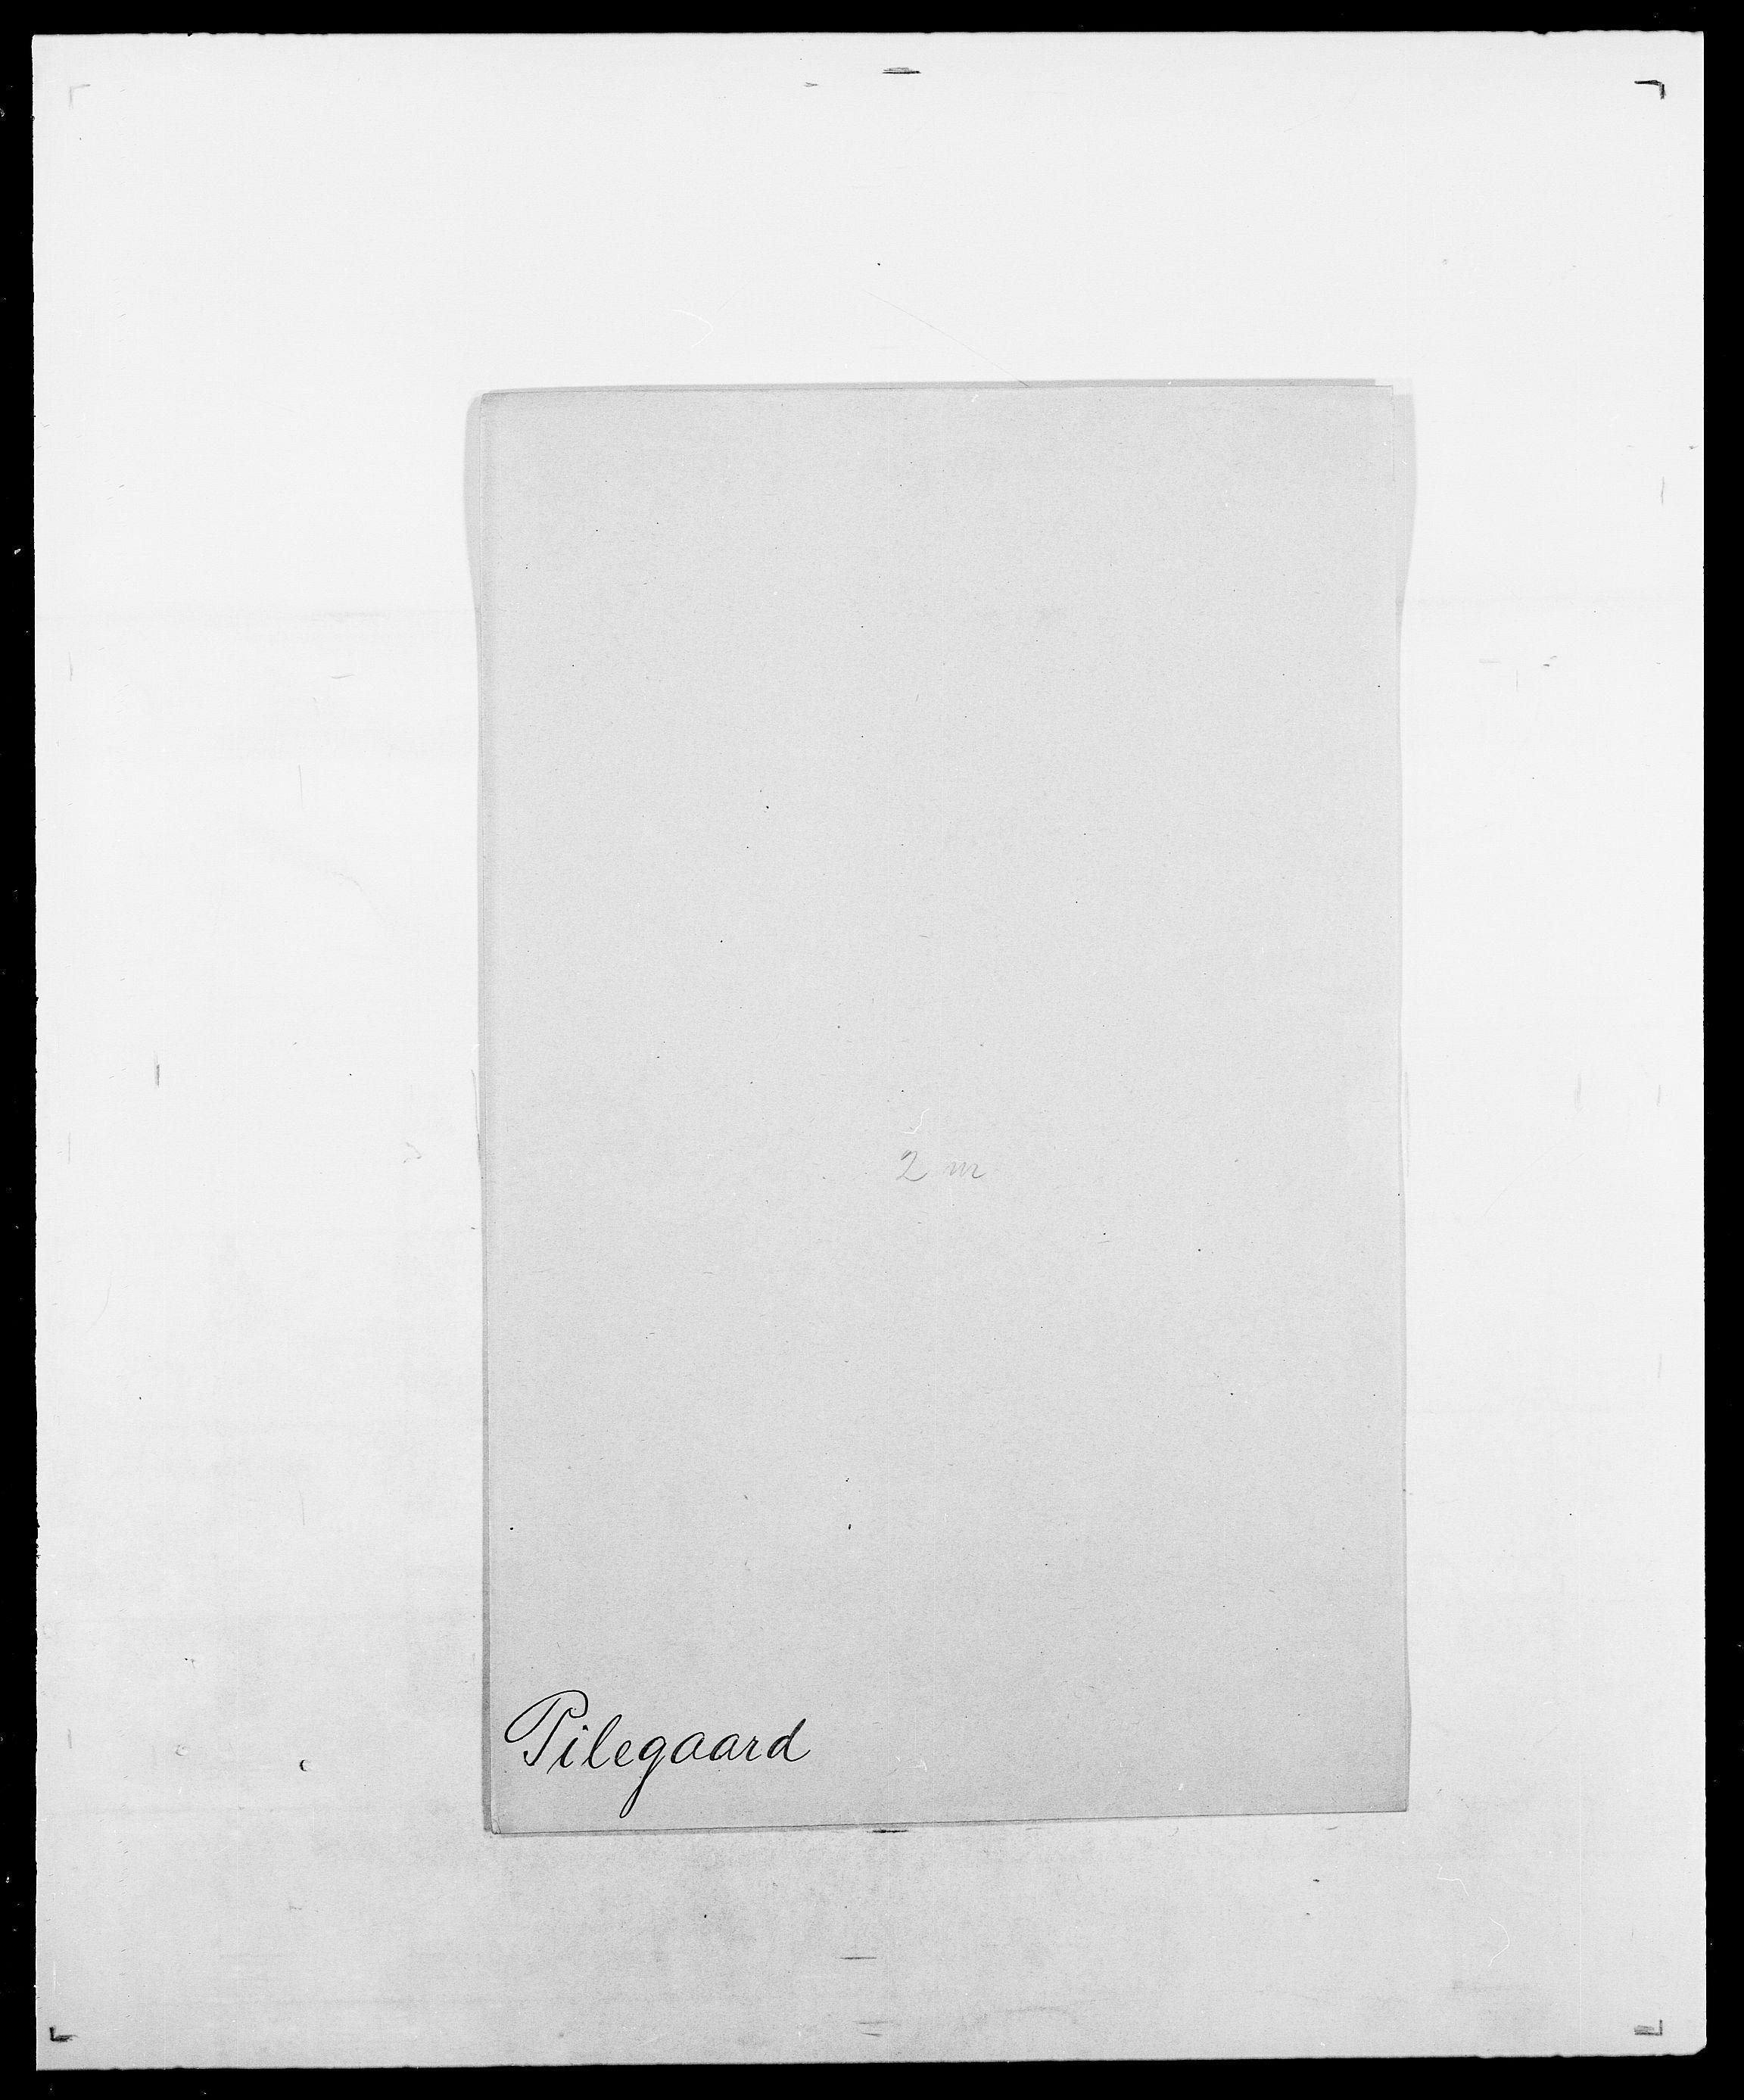 SAO, Delgobe, Charles Antoine - samling, D/Da/L0030: Paars - Pittelkov, s. 542